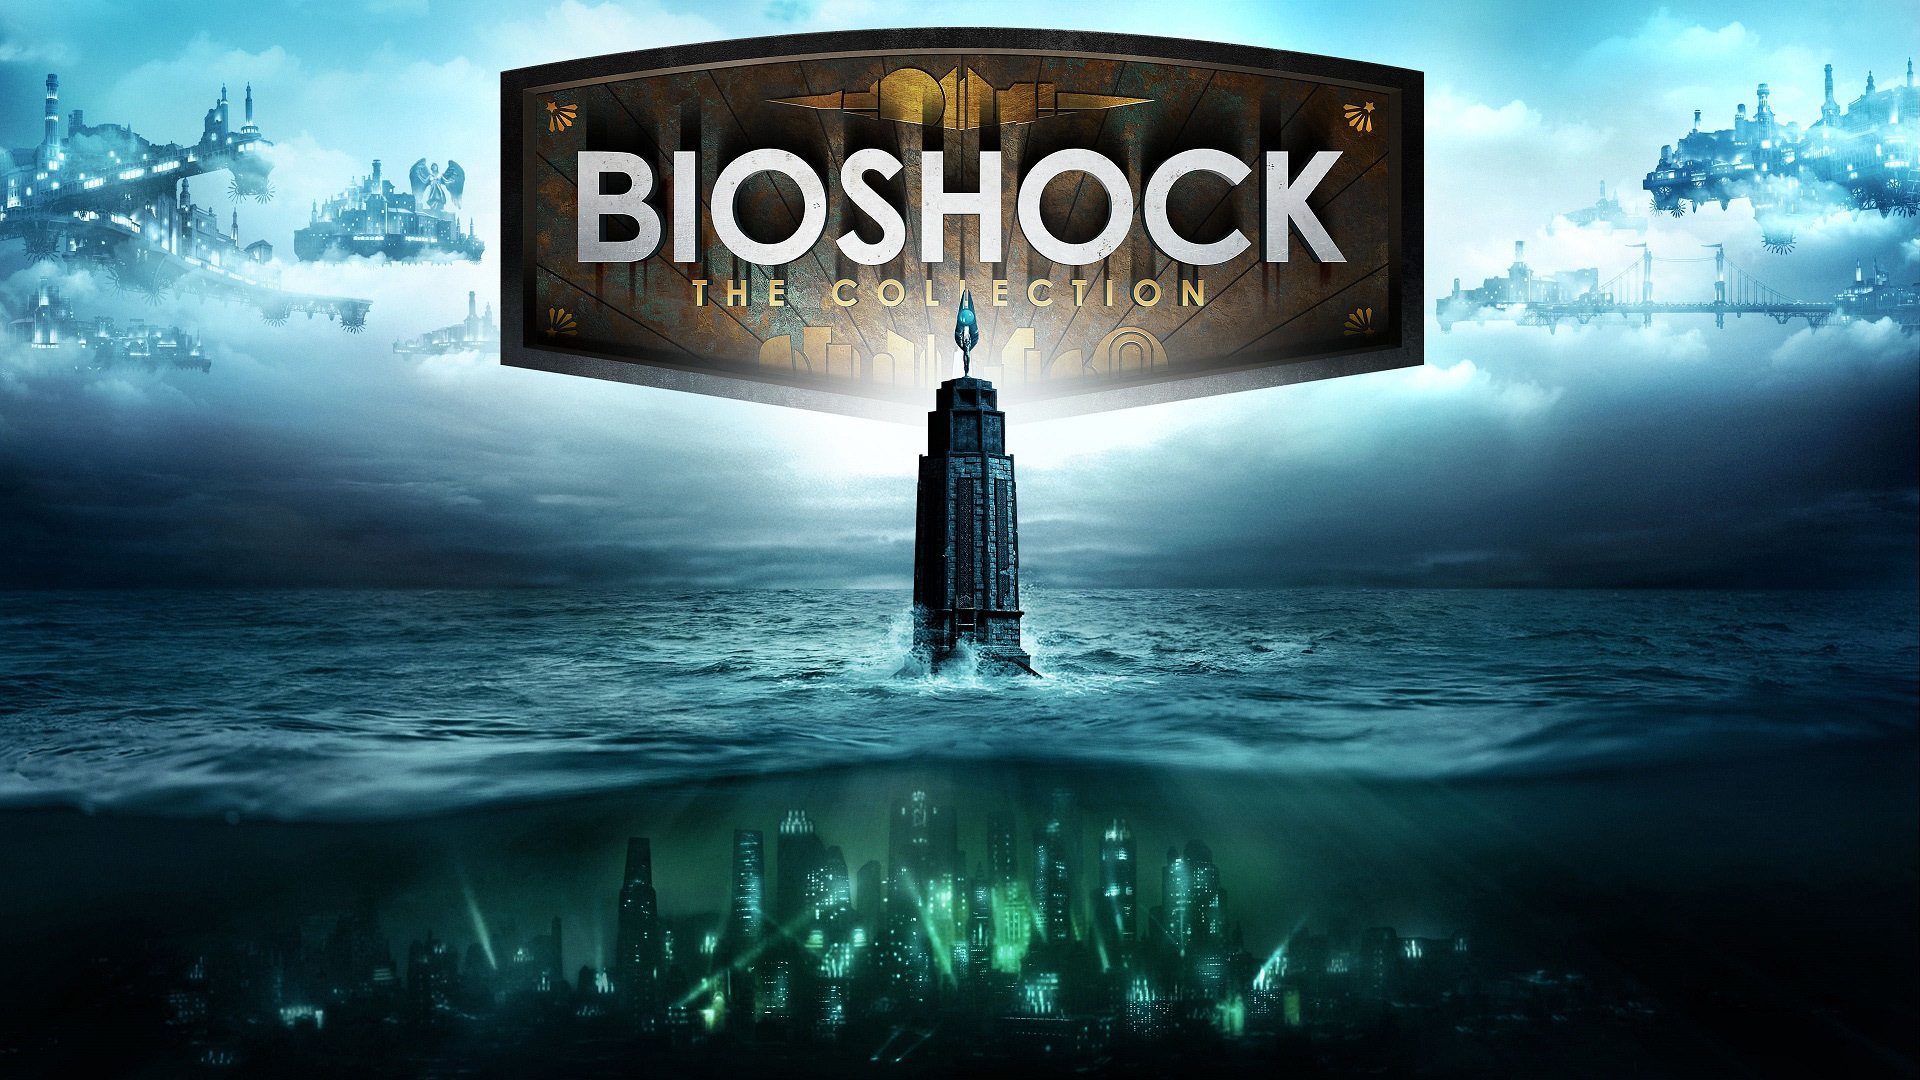 Wallpaper Bioshock Infinite Ps4 Games 1920x1080 Full Hd 2k Picture Image